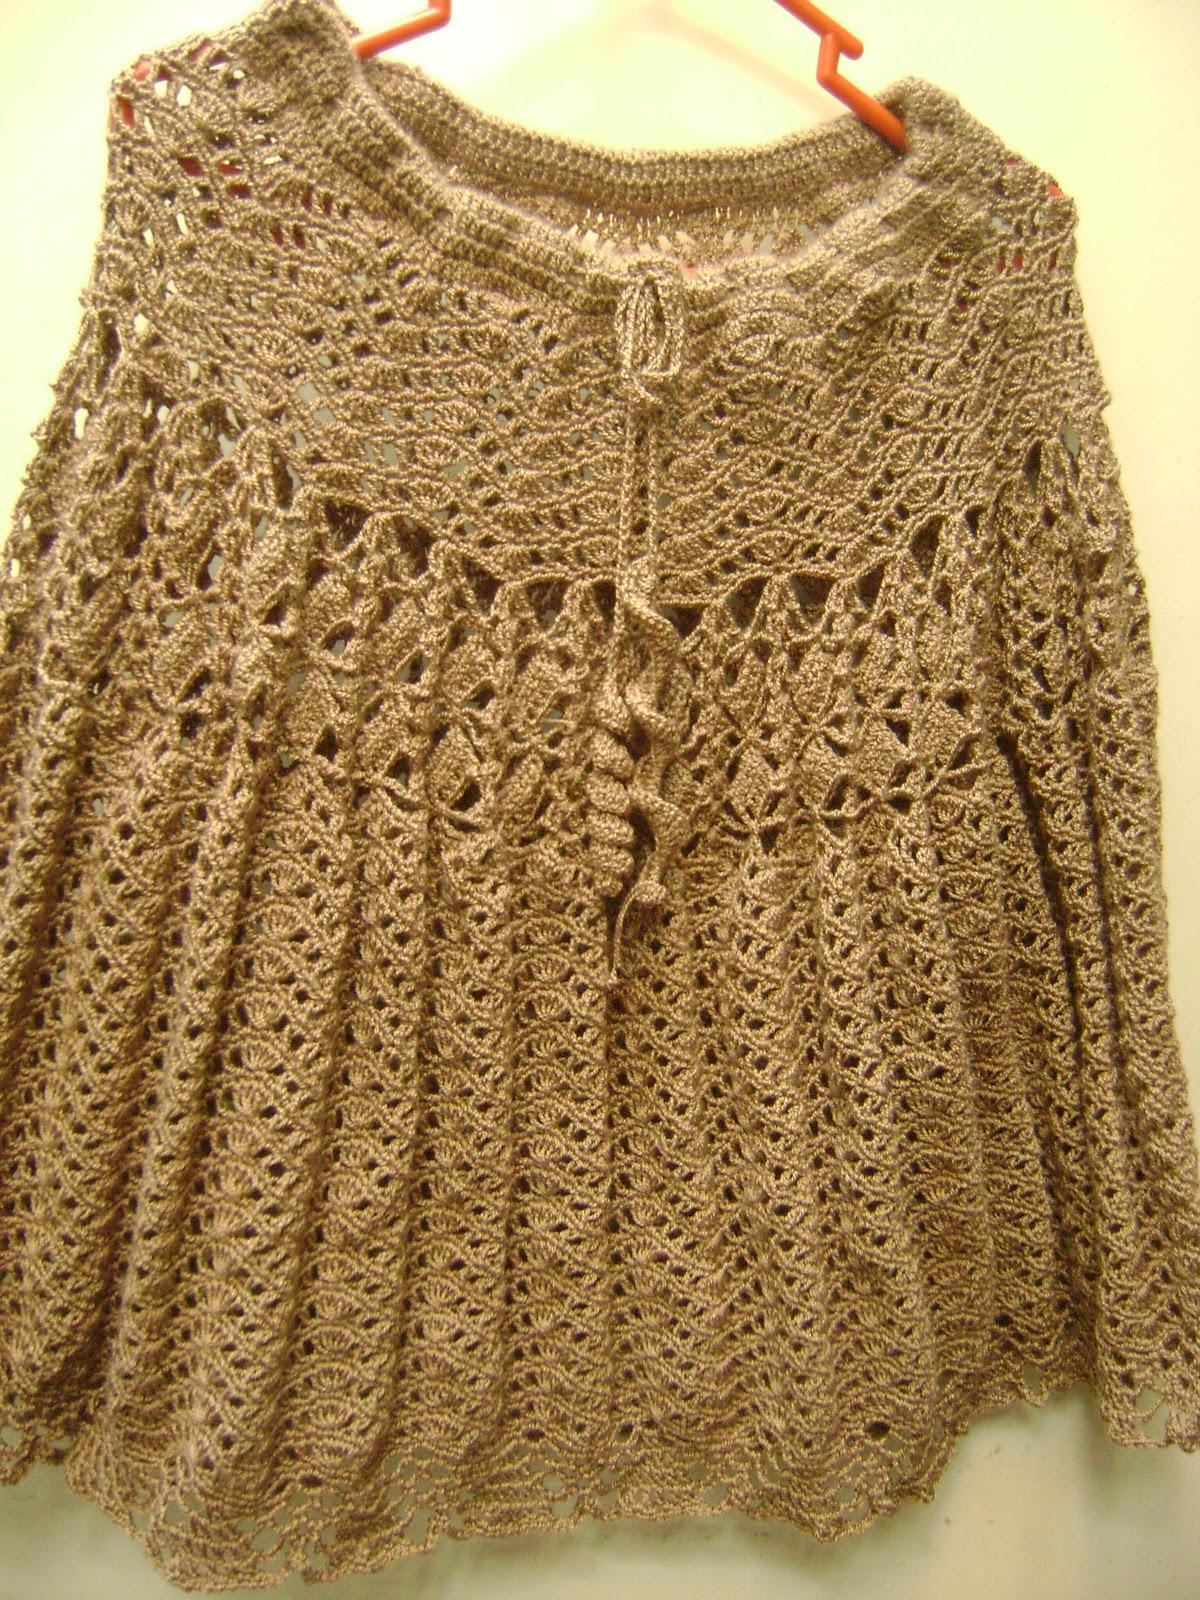 3 falda terminada - Almazuelas patrones gratis ...